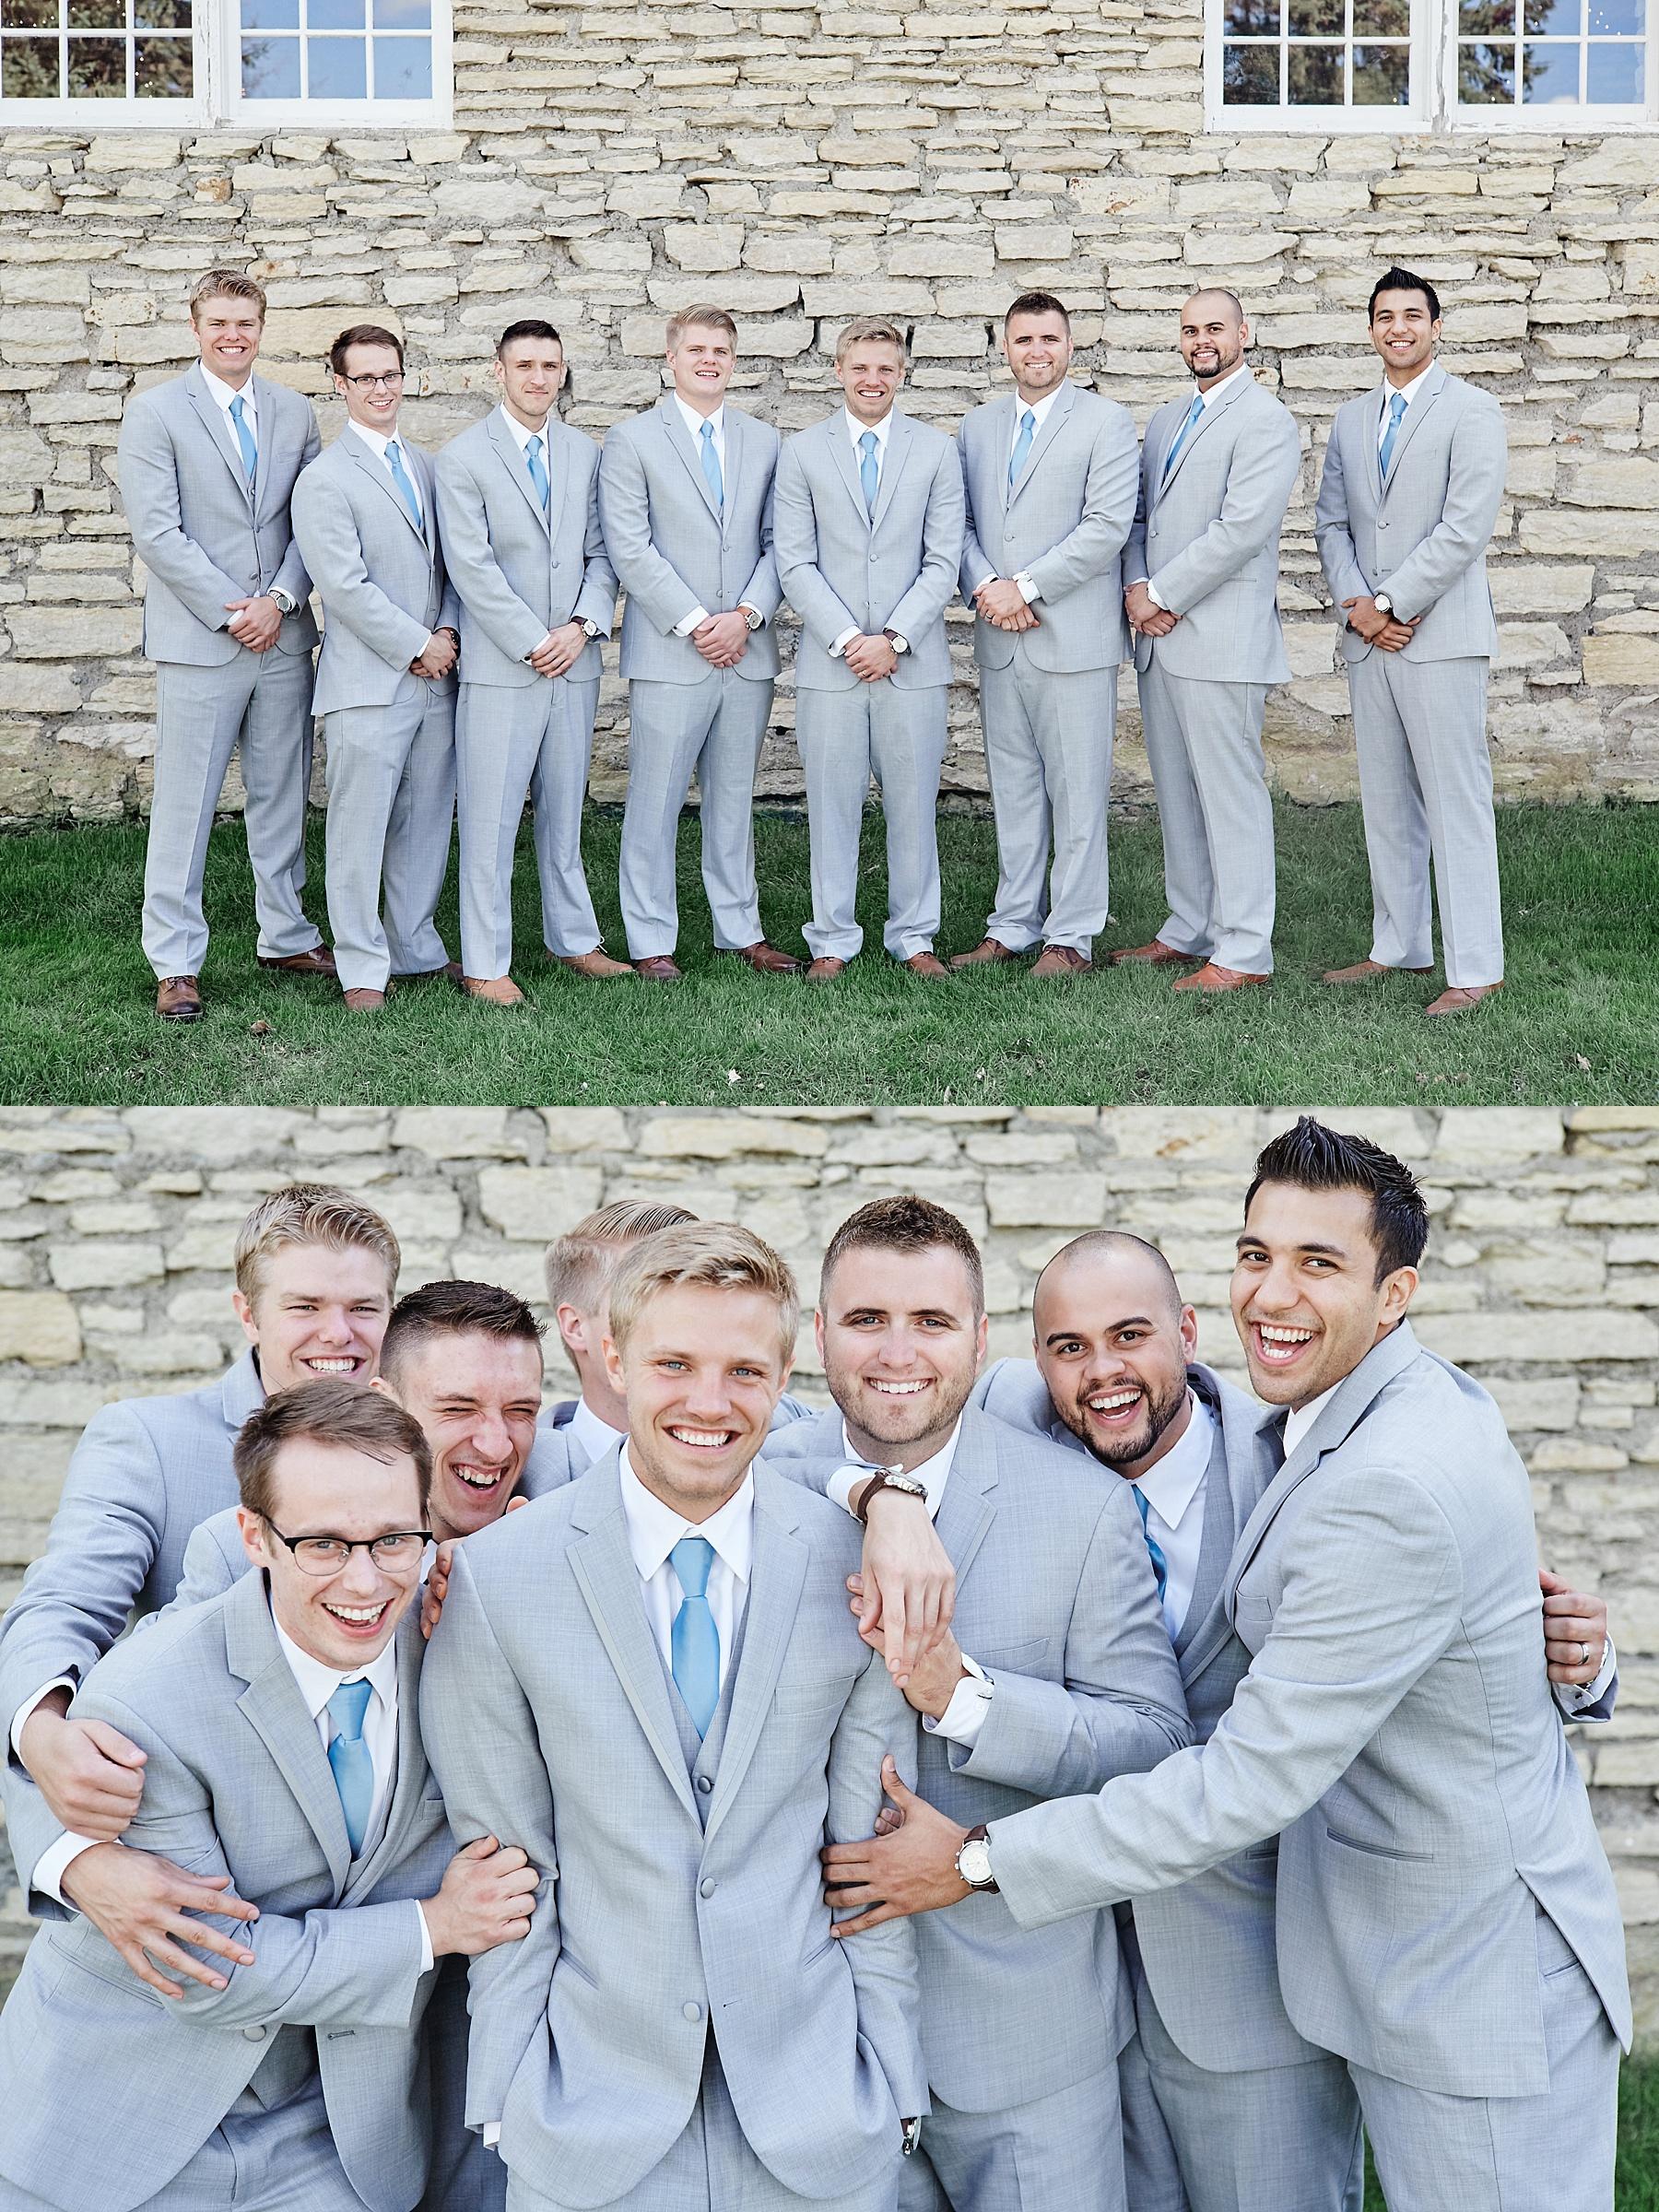 Maywood-Stone-Barn-Wedding-Rochester-Minnesota-Perry-James-Photo_0601.jpg